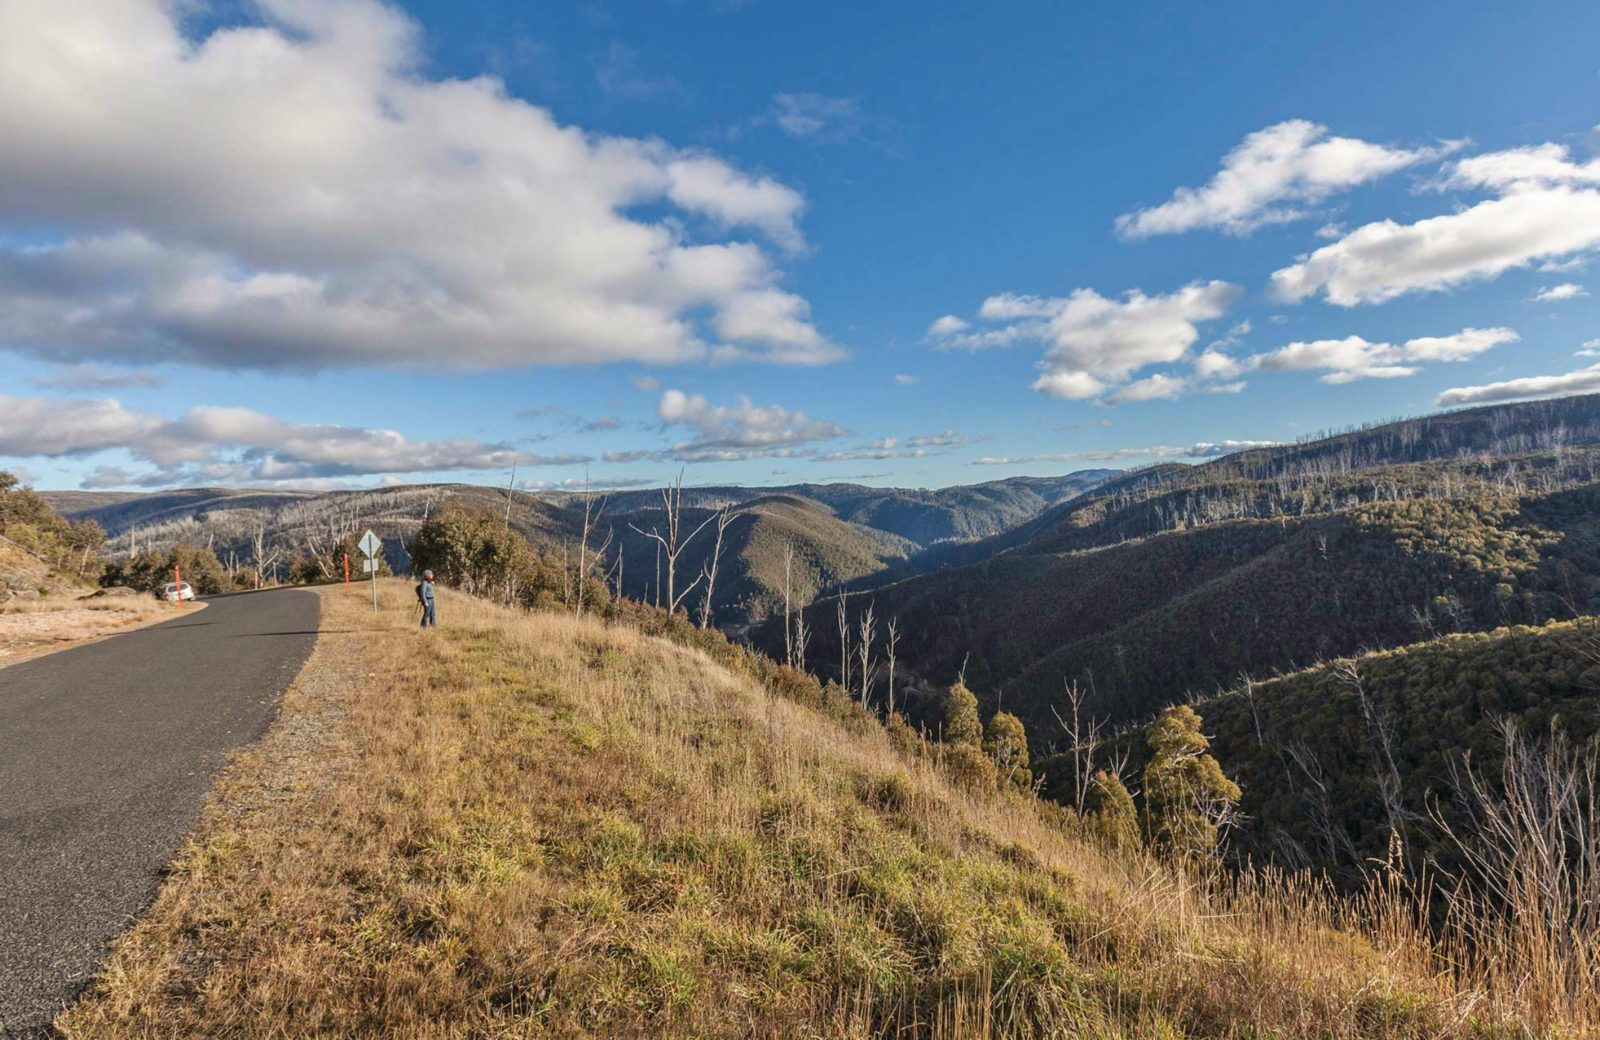 Alpine high country near Cabramurra, Kosciuszko National Park Photo: Murray Vanderveer